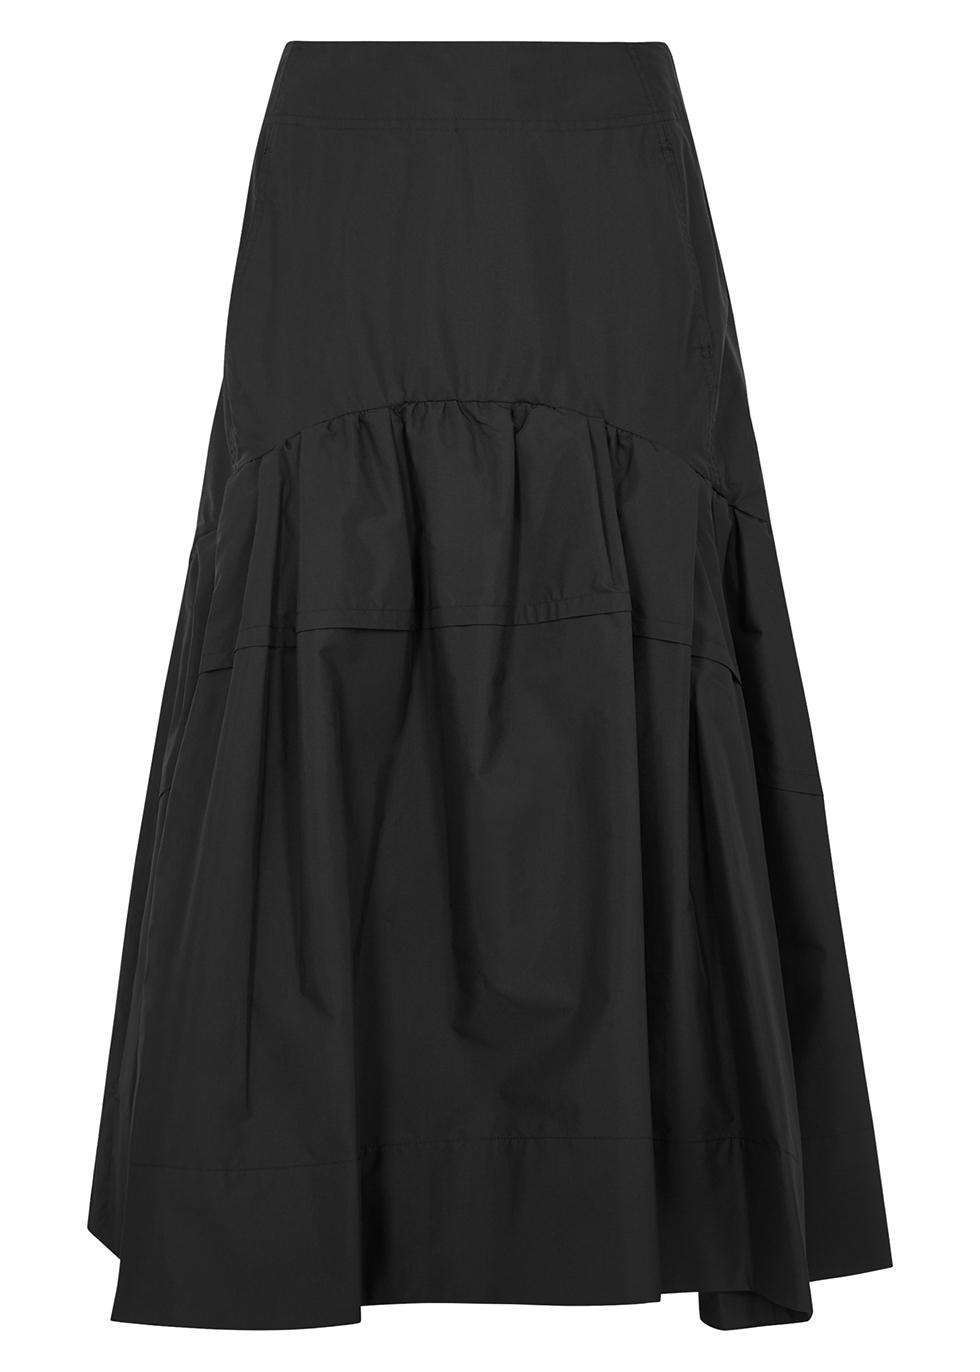 Black cotton-blend midi skirt